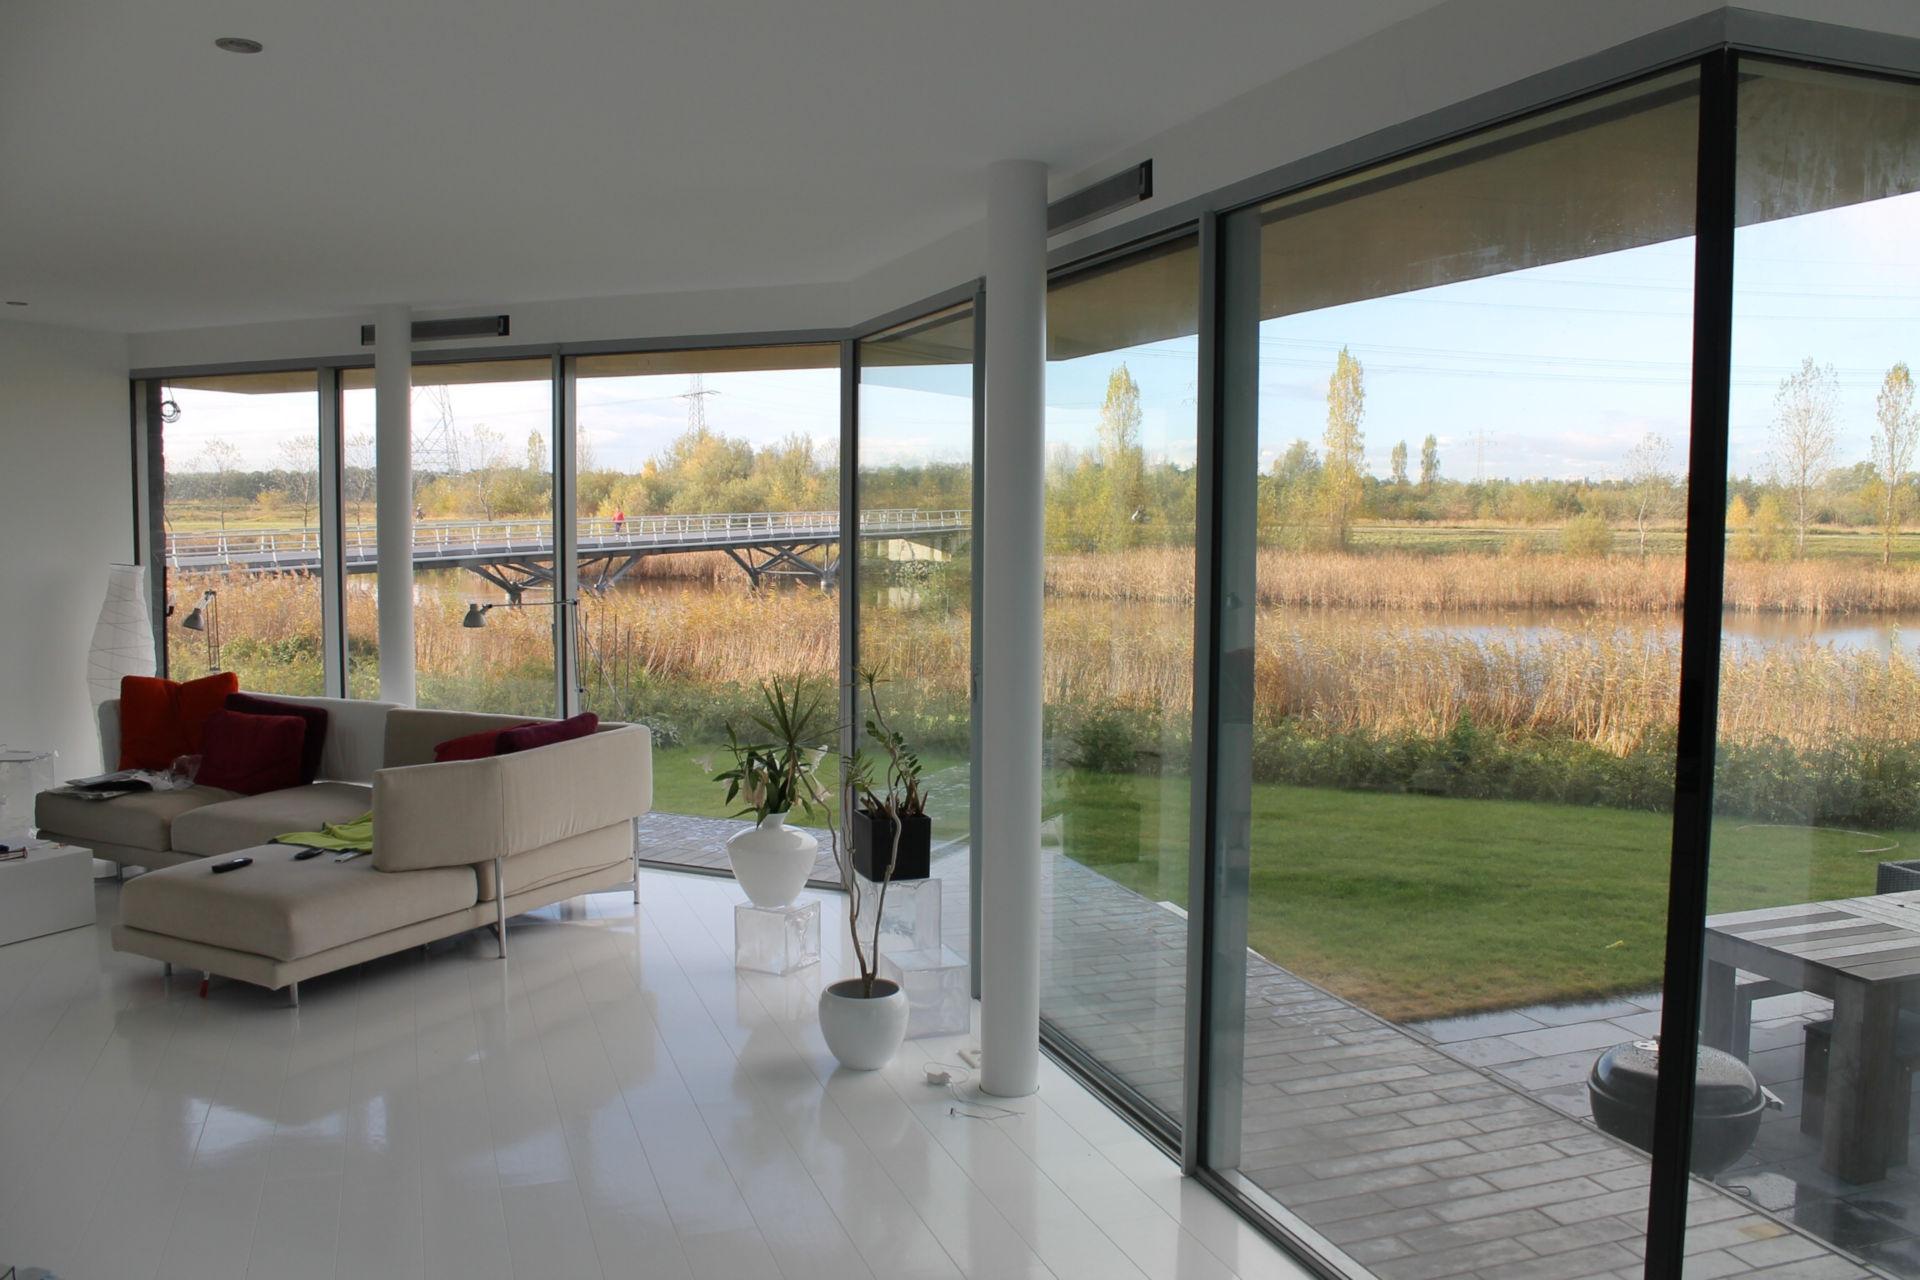 flint-house-ultra-thin-framed-sliding-glass-doors